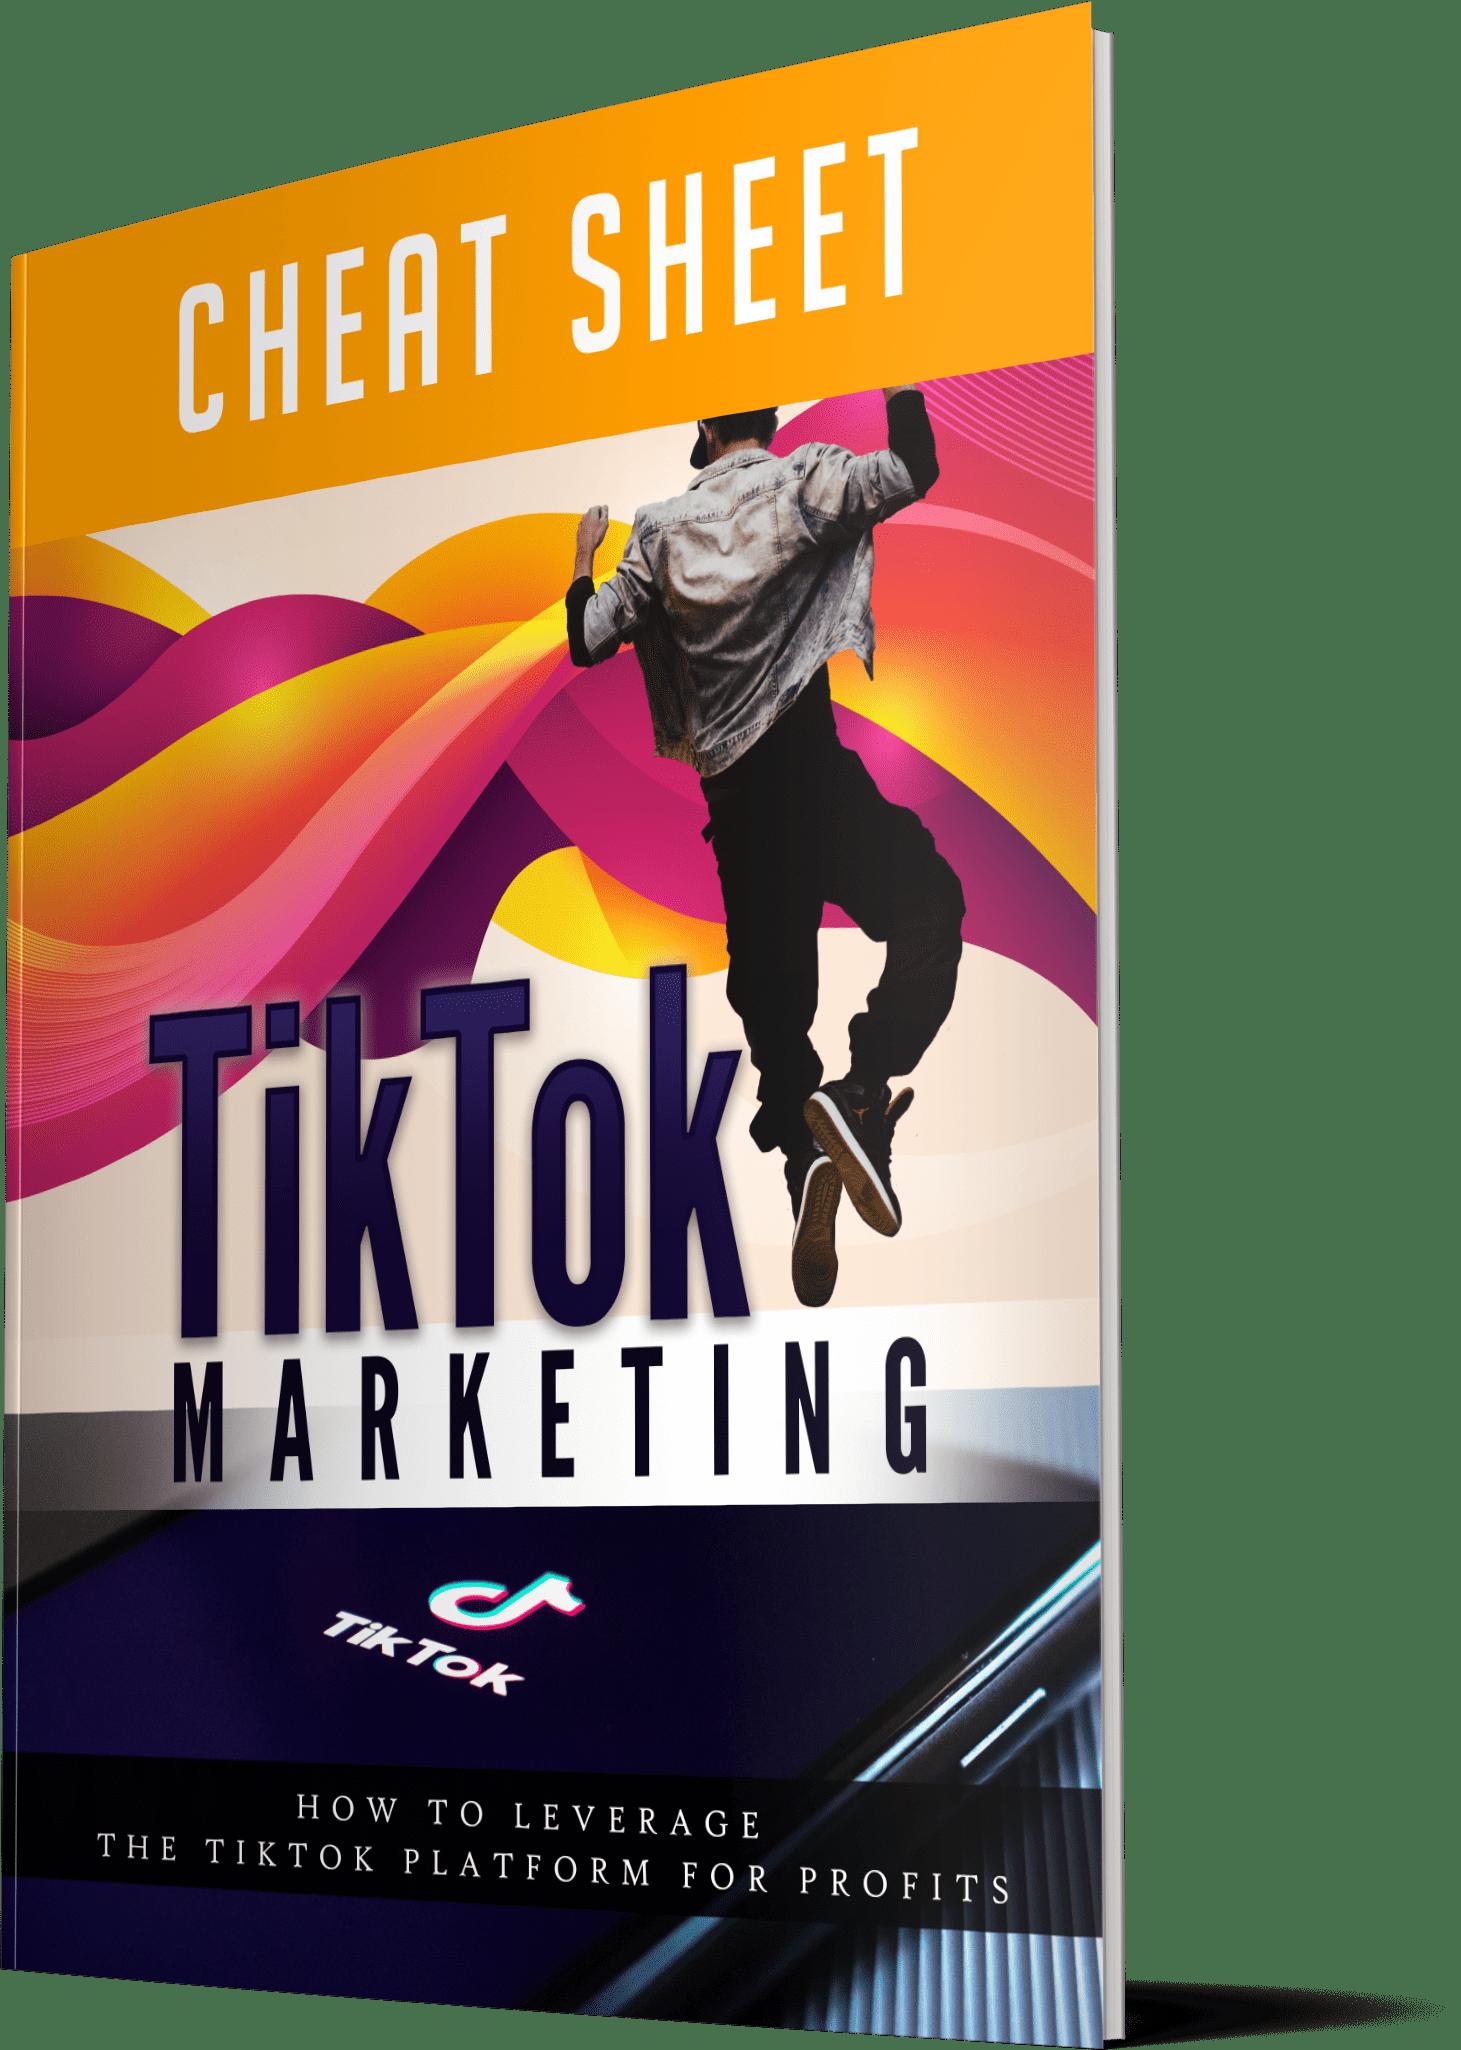 Tiktok Marketing Guide Successful Marketing Campaigns Marketing Guide Marketing